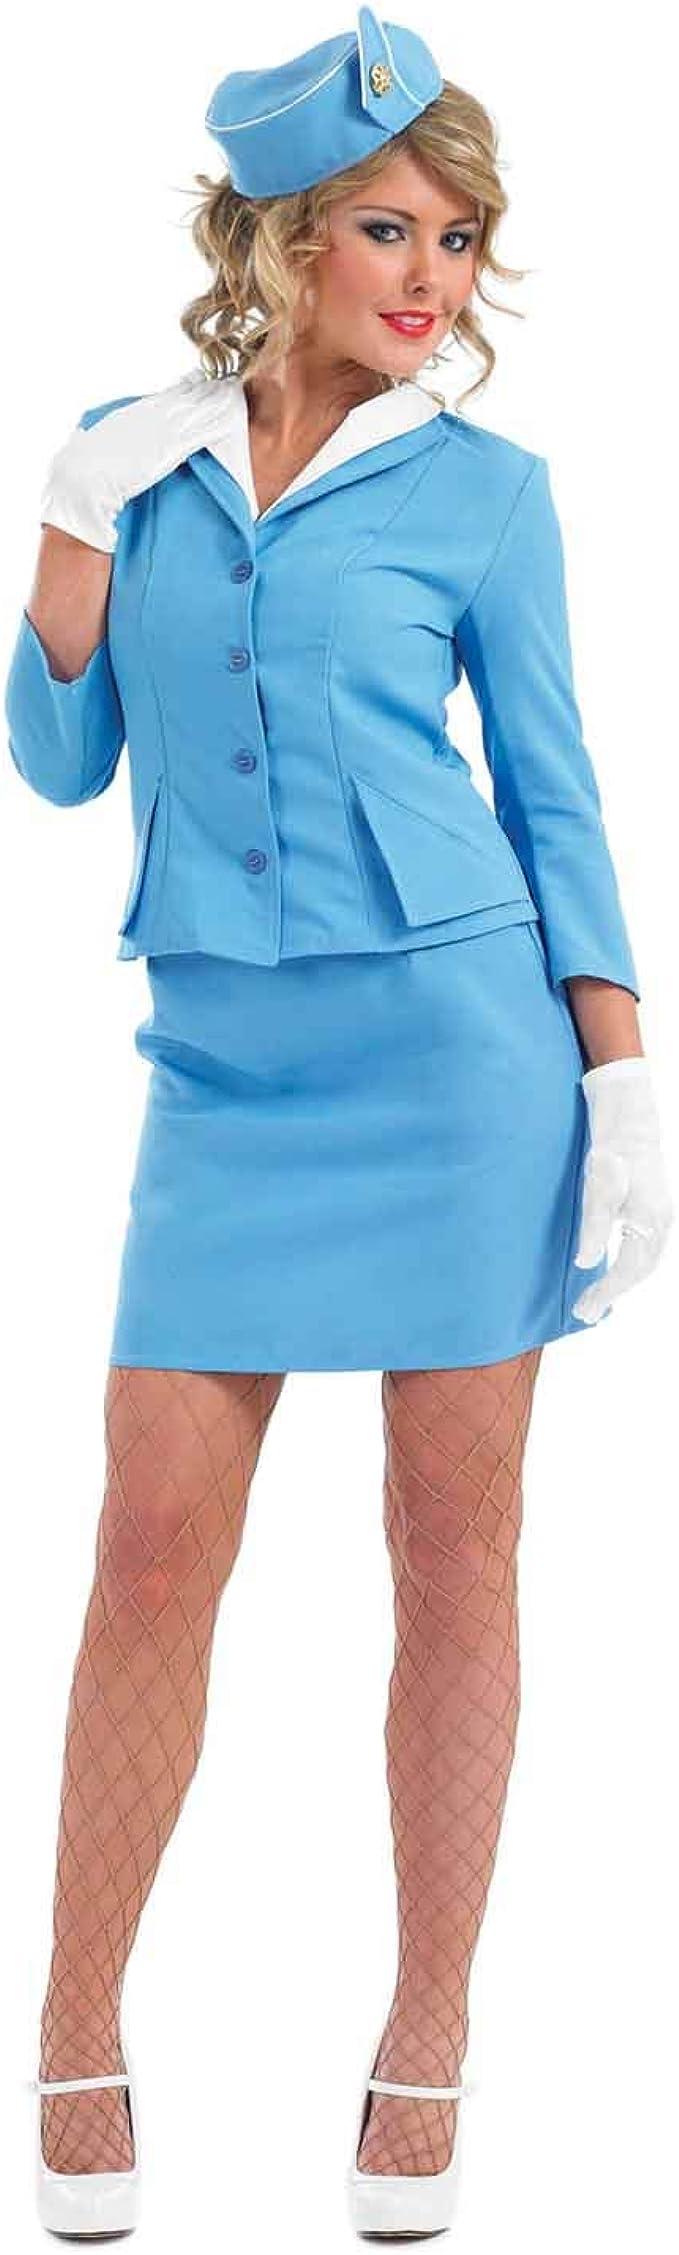 60s Costumes: Hippie, Go Go Dancer, Flower Child, Mod Style fun shack Flight Attendant Costume Blue Halloween Dress Available in Small Medium Large XL XXL  AT vintagedancer.com